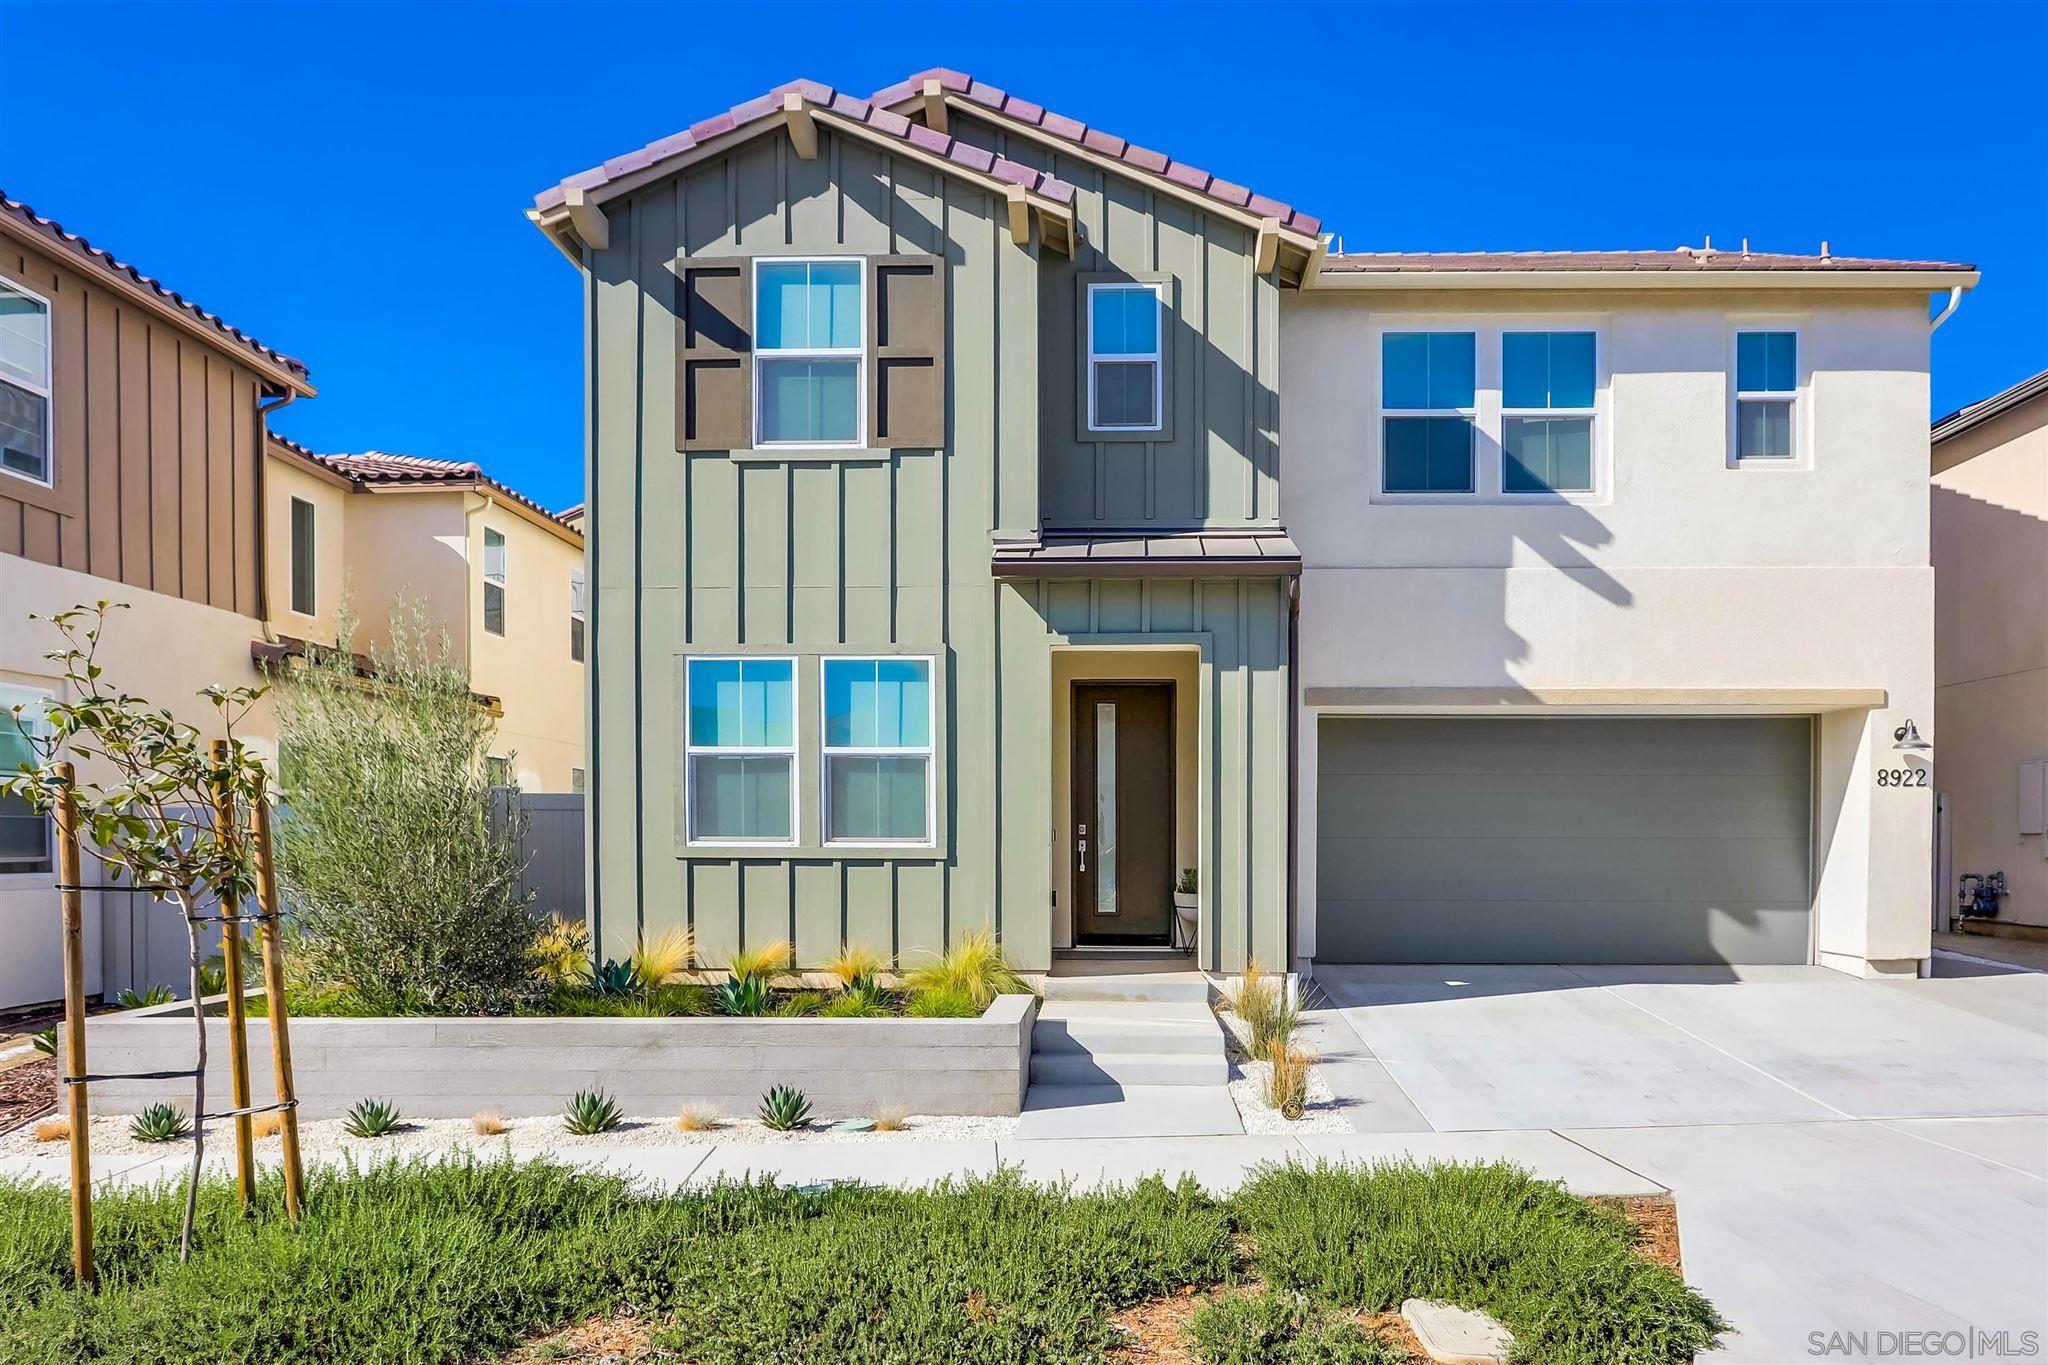 Main Photo: SANTEE House for sale : 4 bedrooms : 8922 Trailridge Ave